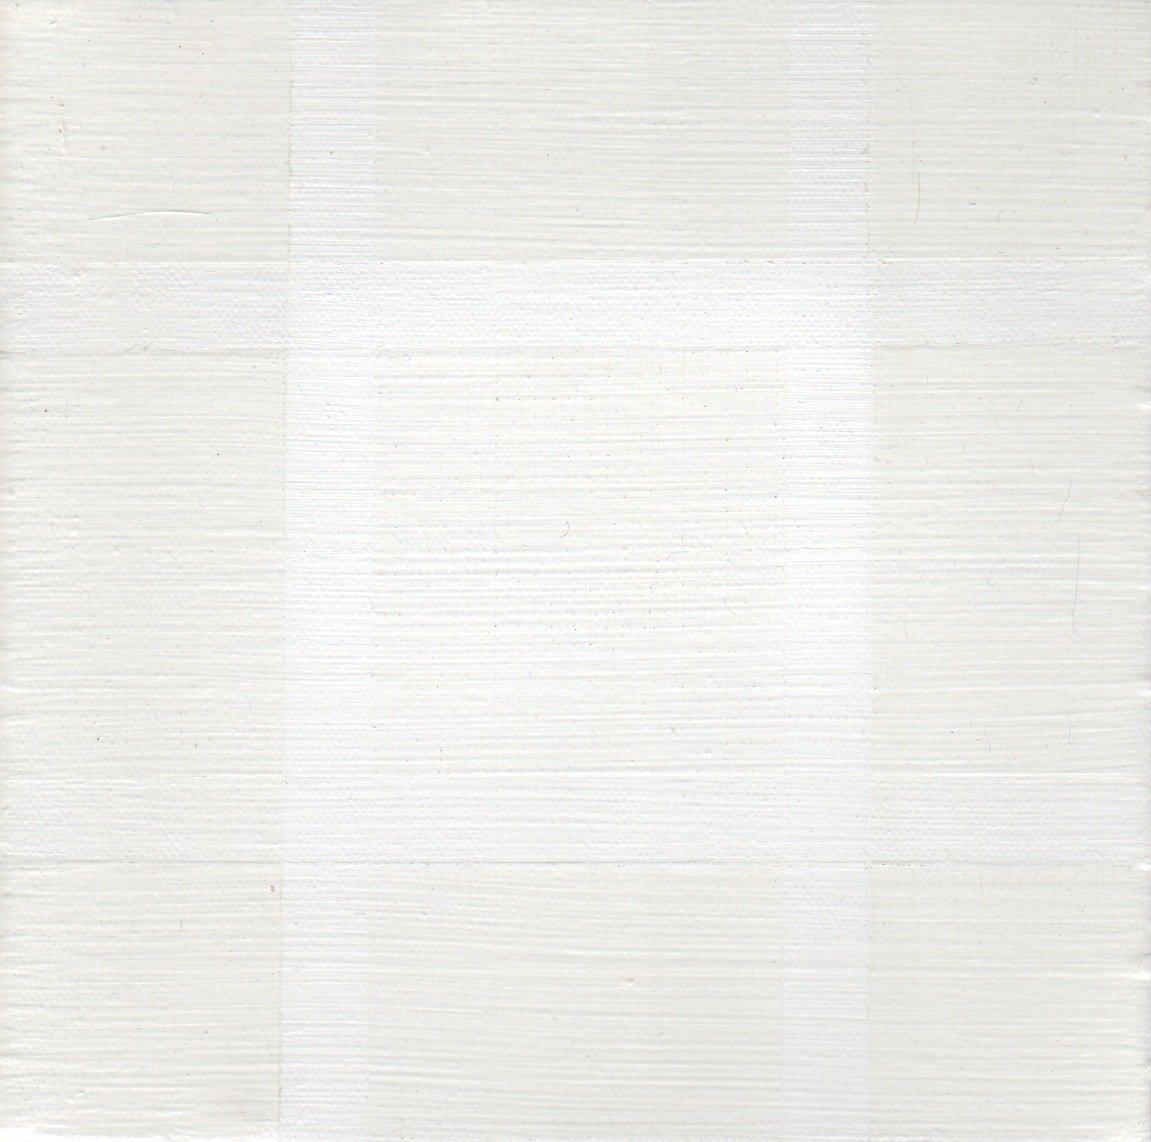 Polyphon/weiß/Polyphon/white 04 54_Polyphon/weiß/Polyphon/white 04